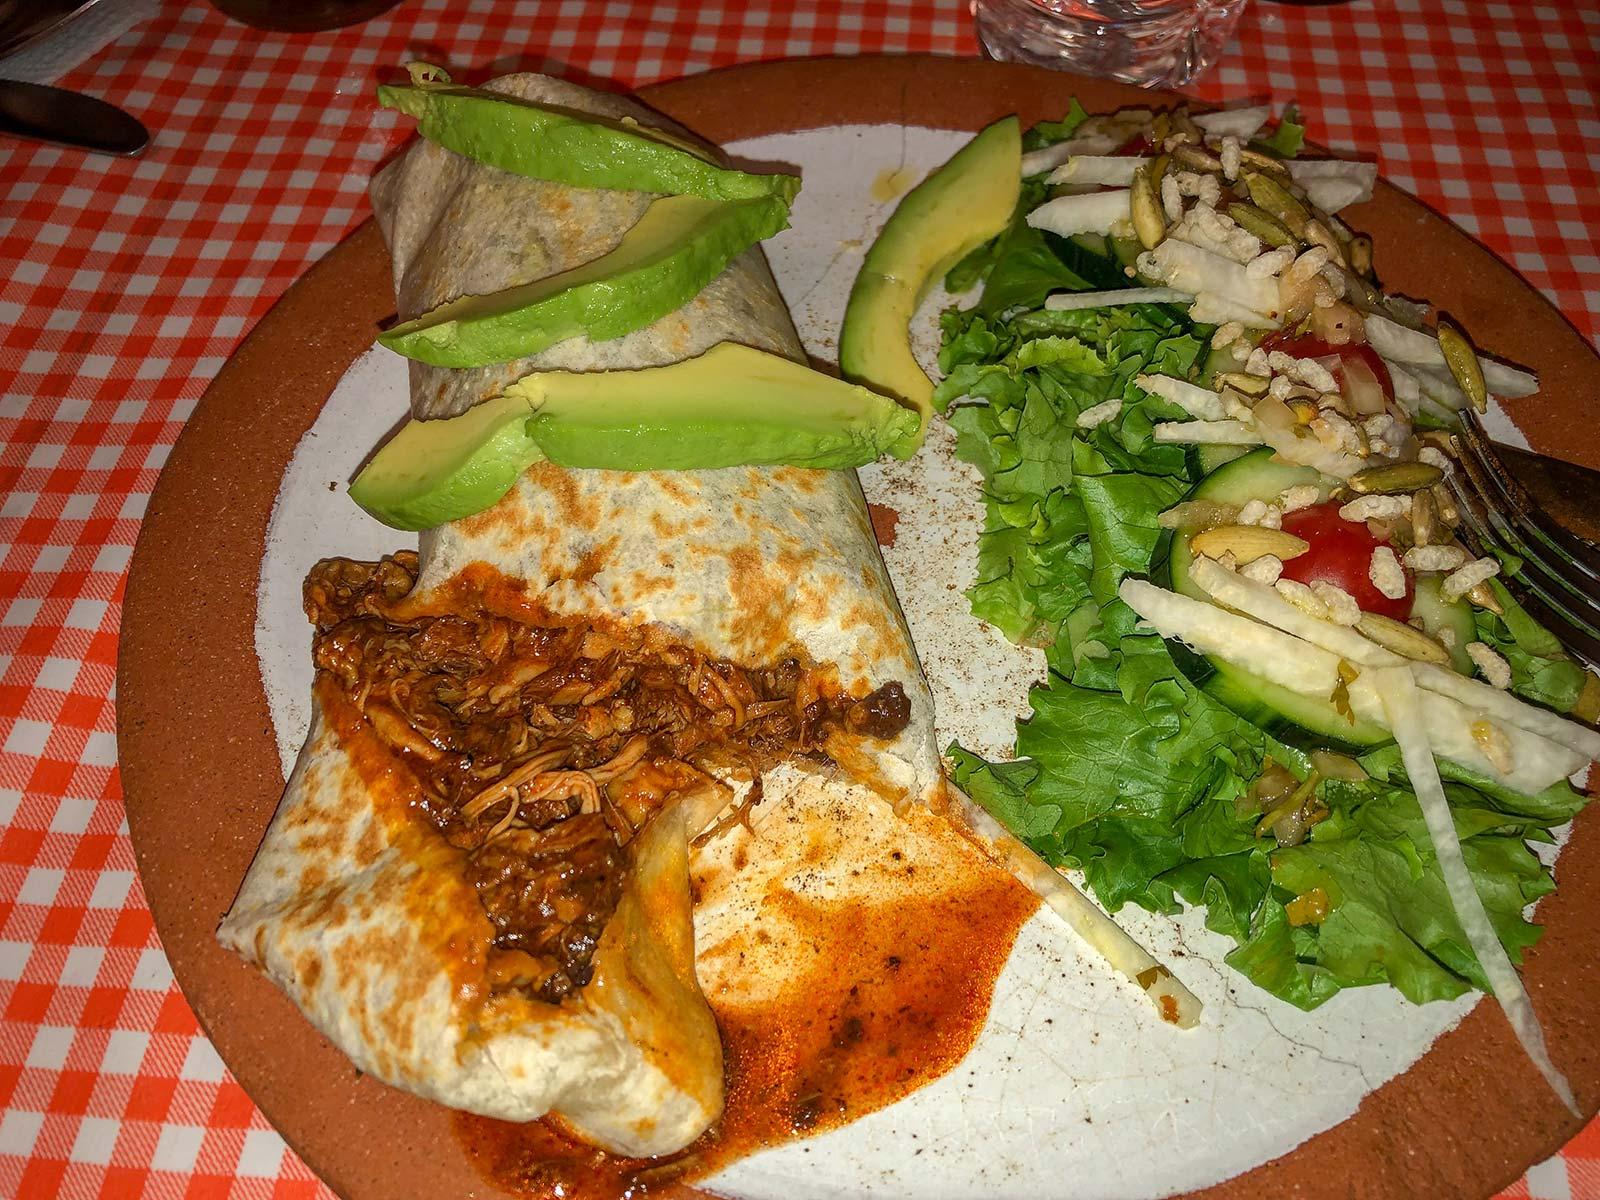 Burrito mit chili-pulled-pork